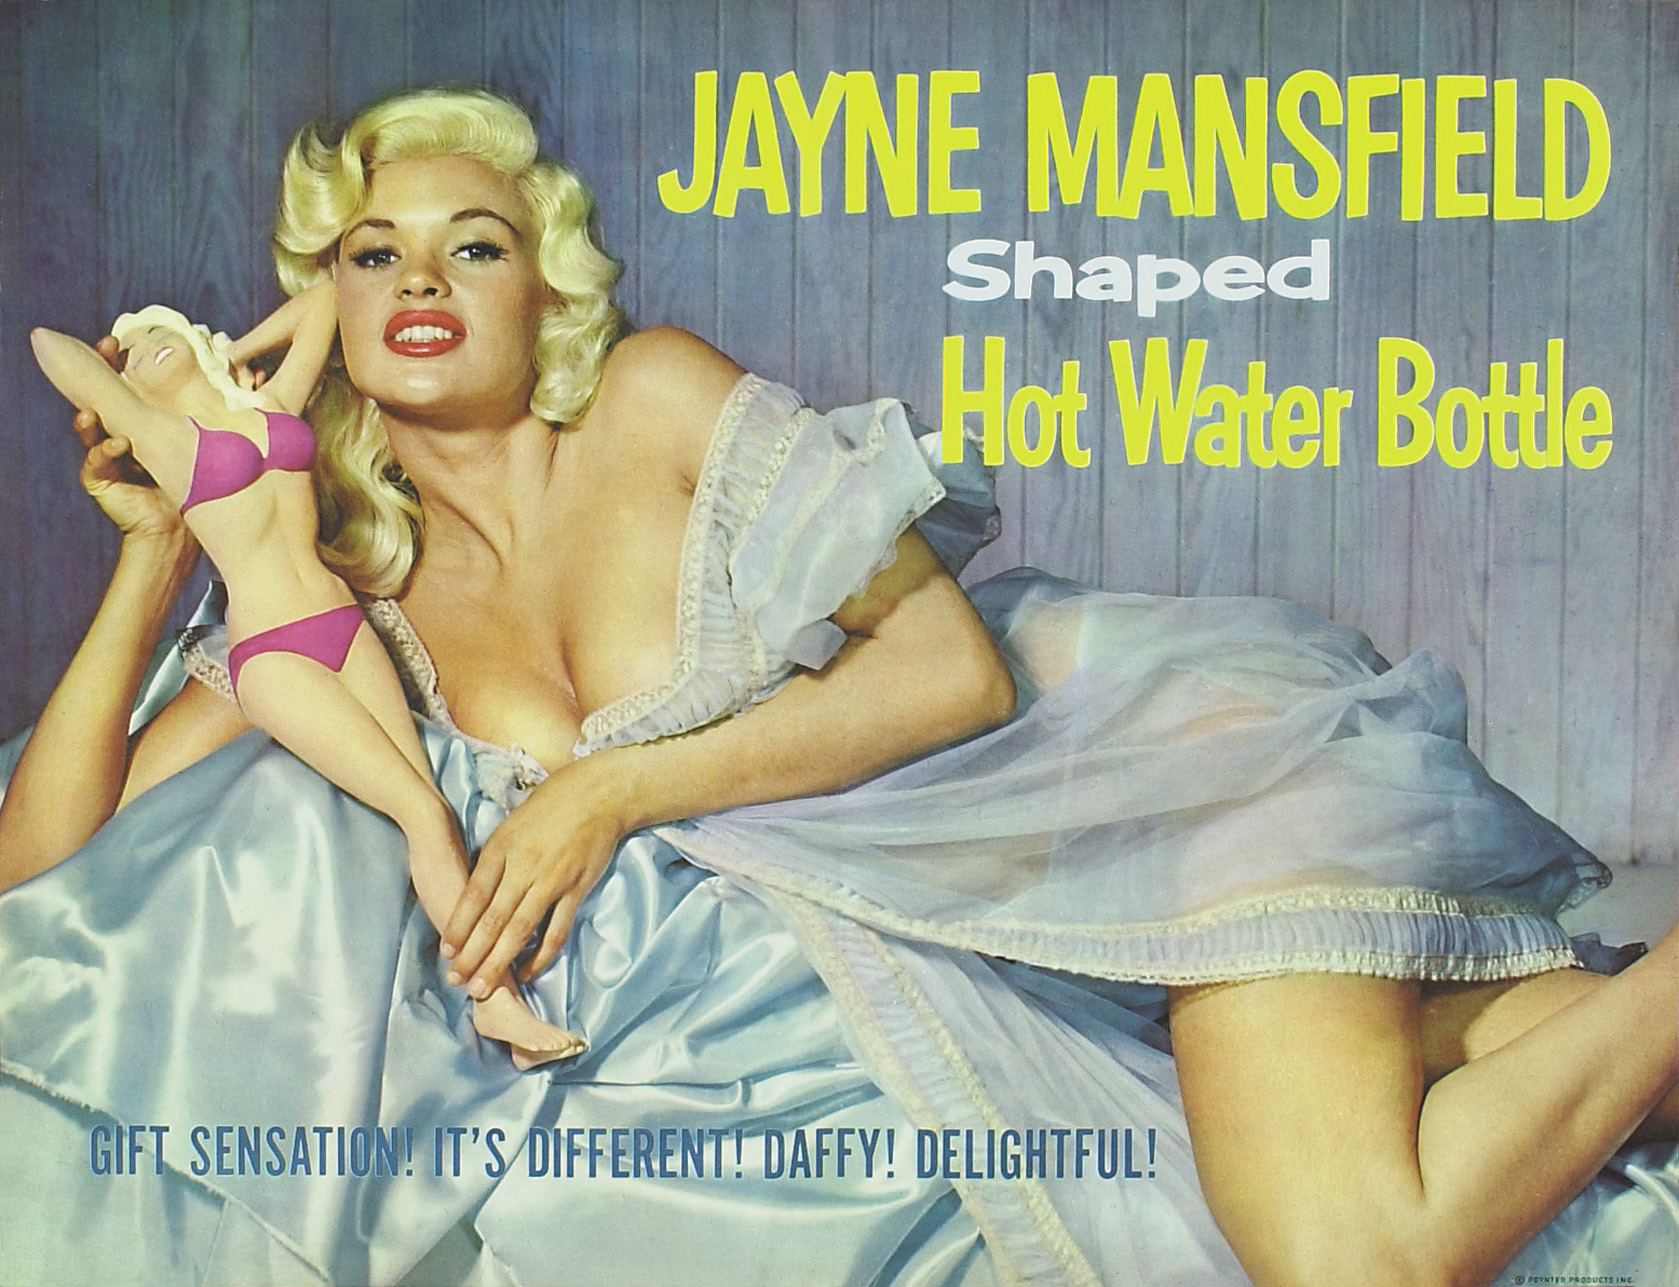 jayne mansfield death